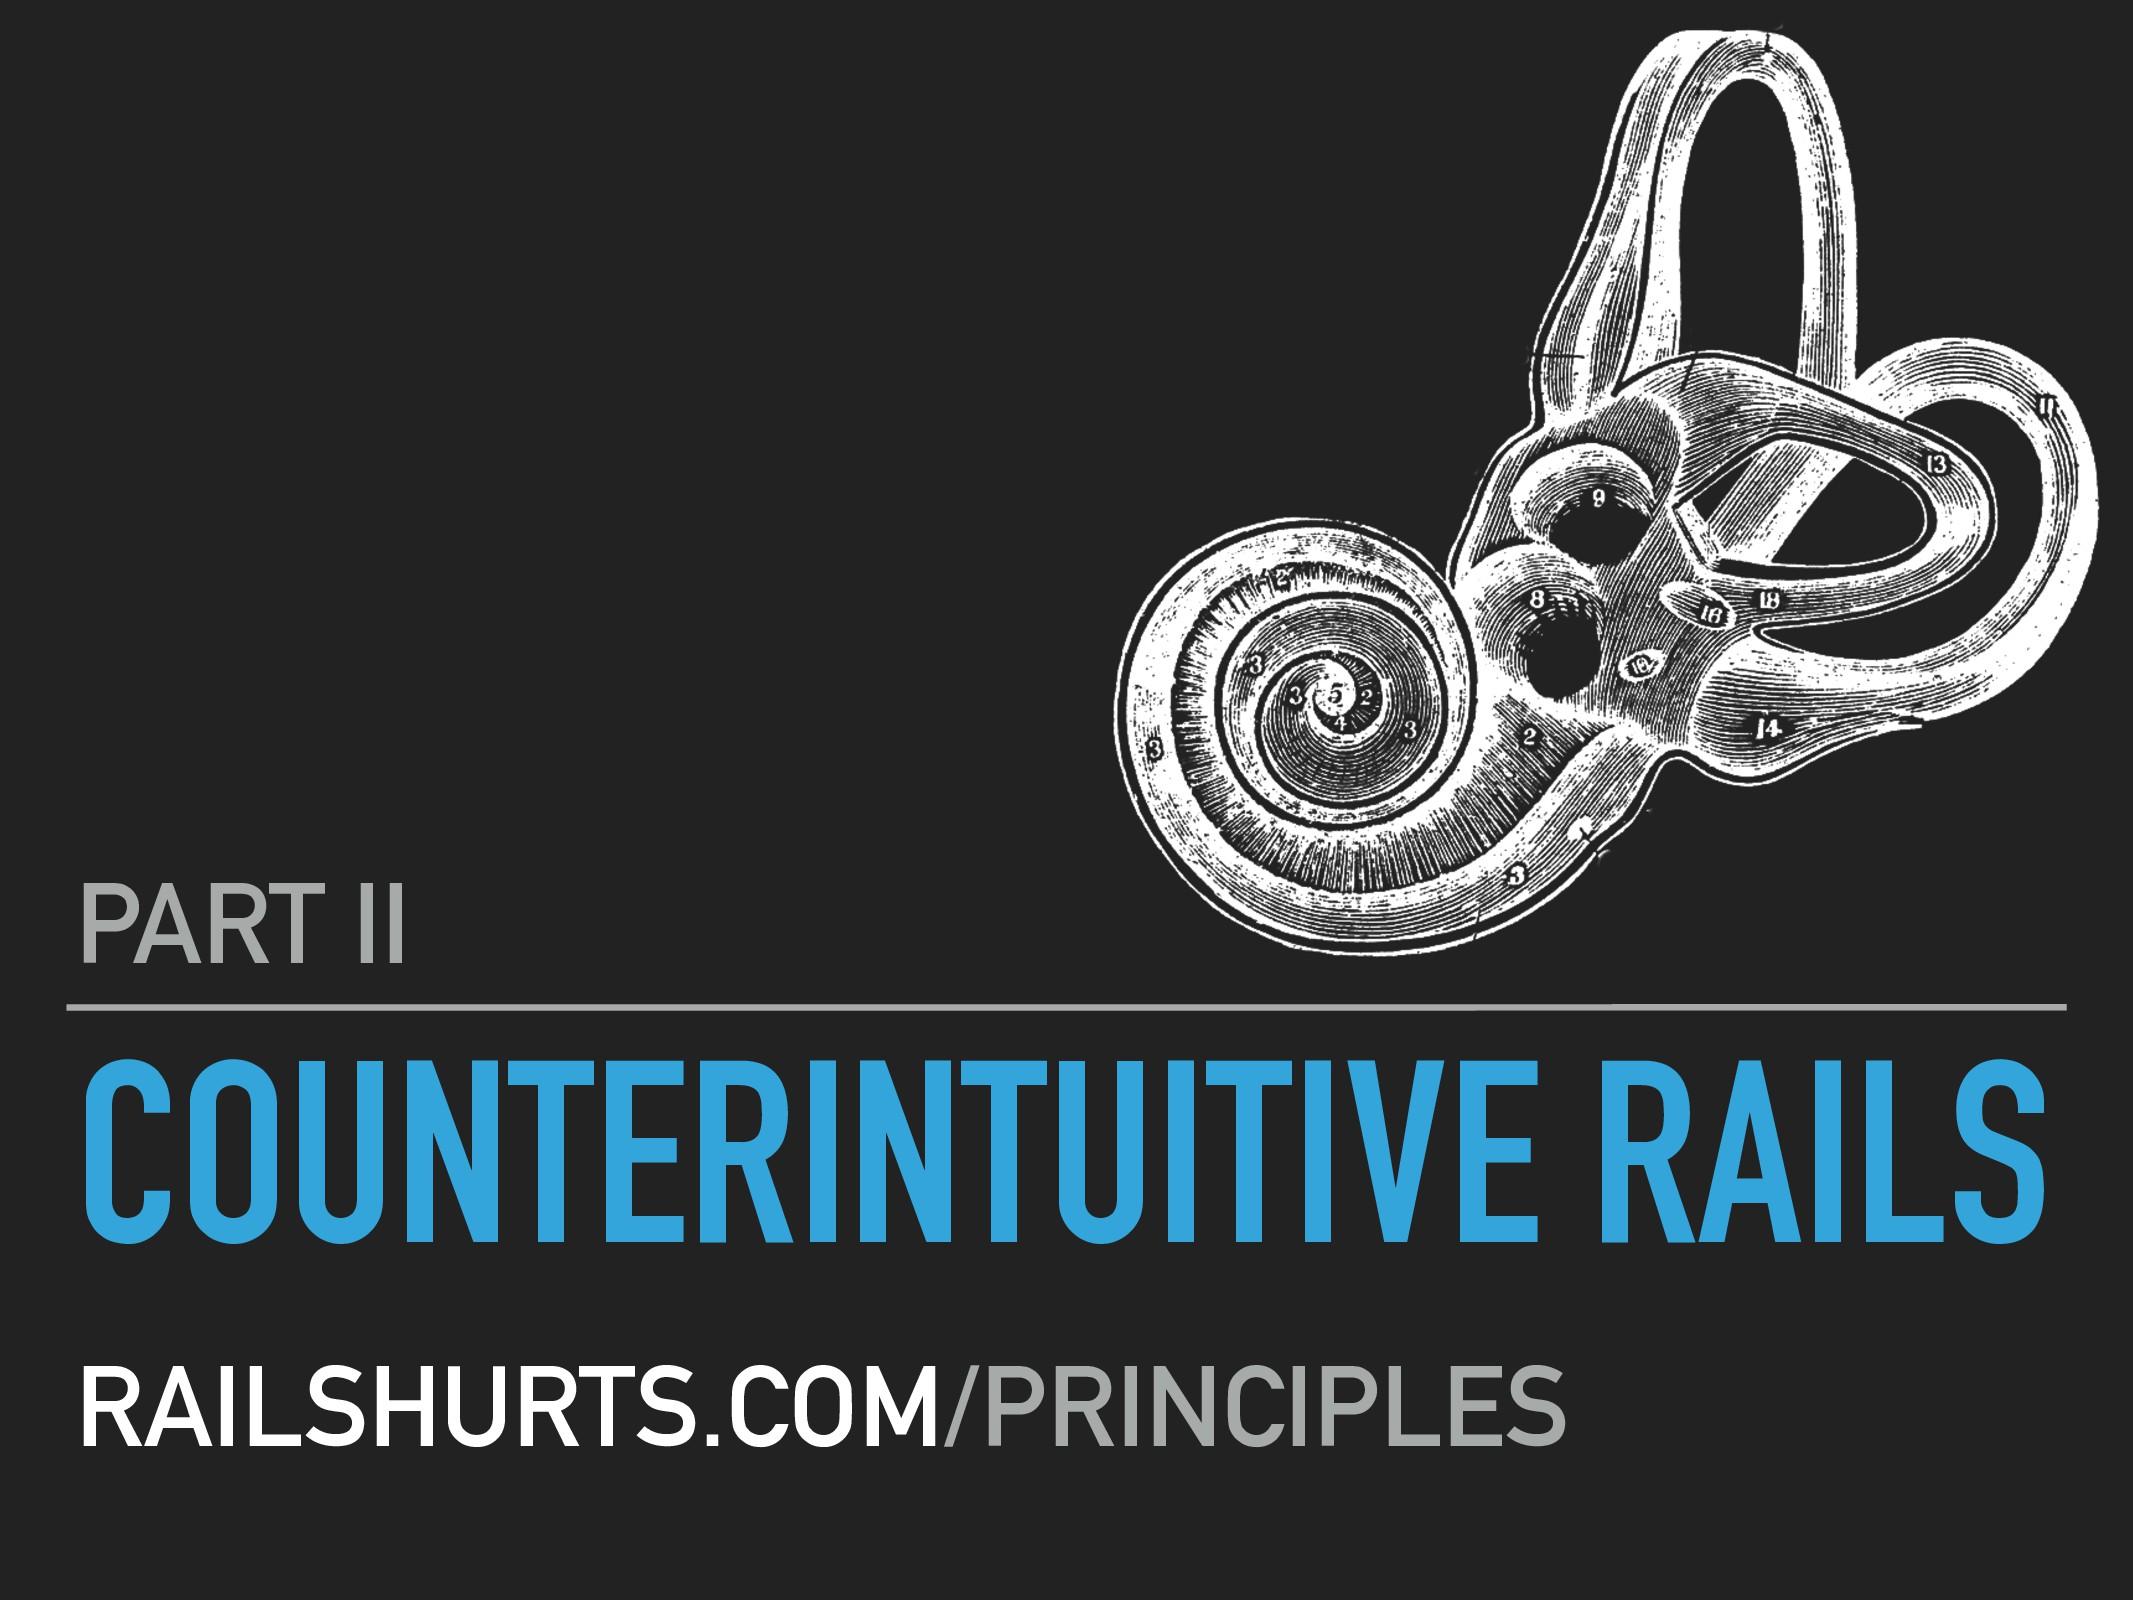 COUNTERINTUITIVE RAILS PART II RAILSHURTS.COM/P...